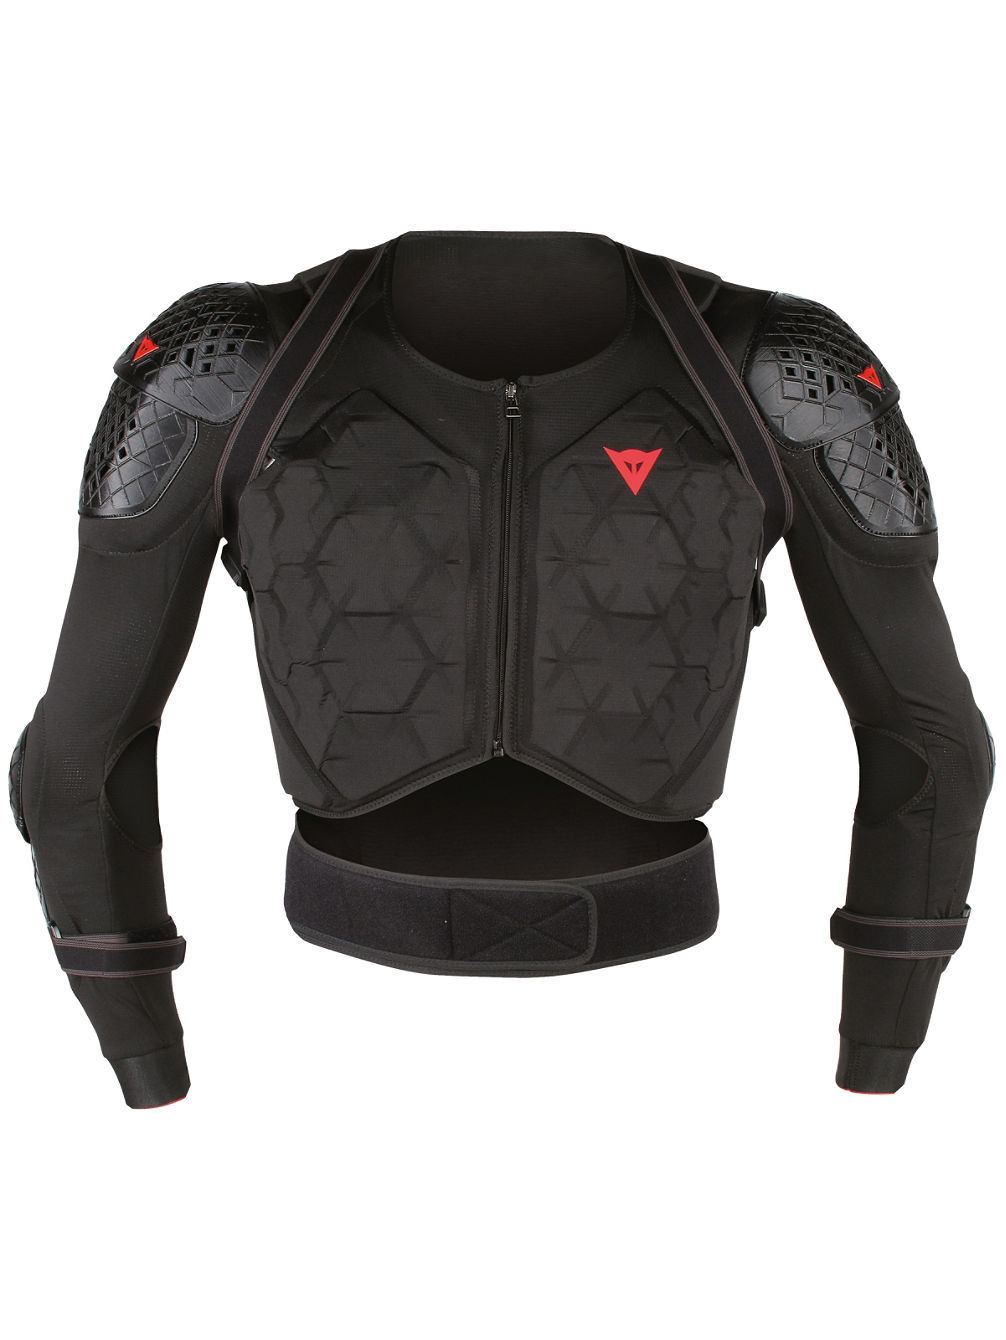 dainese armoform manis safety jacket r ckenprotektor. Black Bedroom Furniture Sets. Home Design Ideas